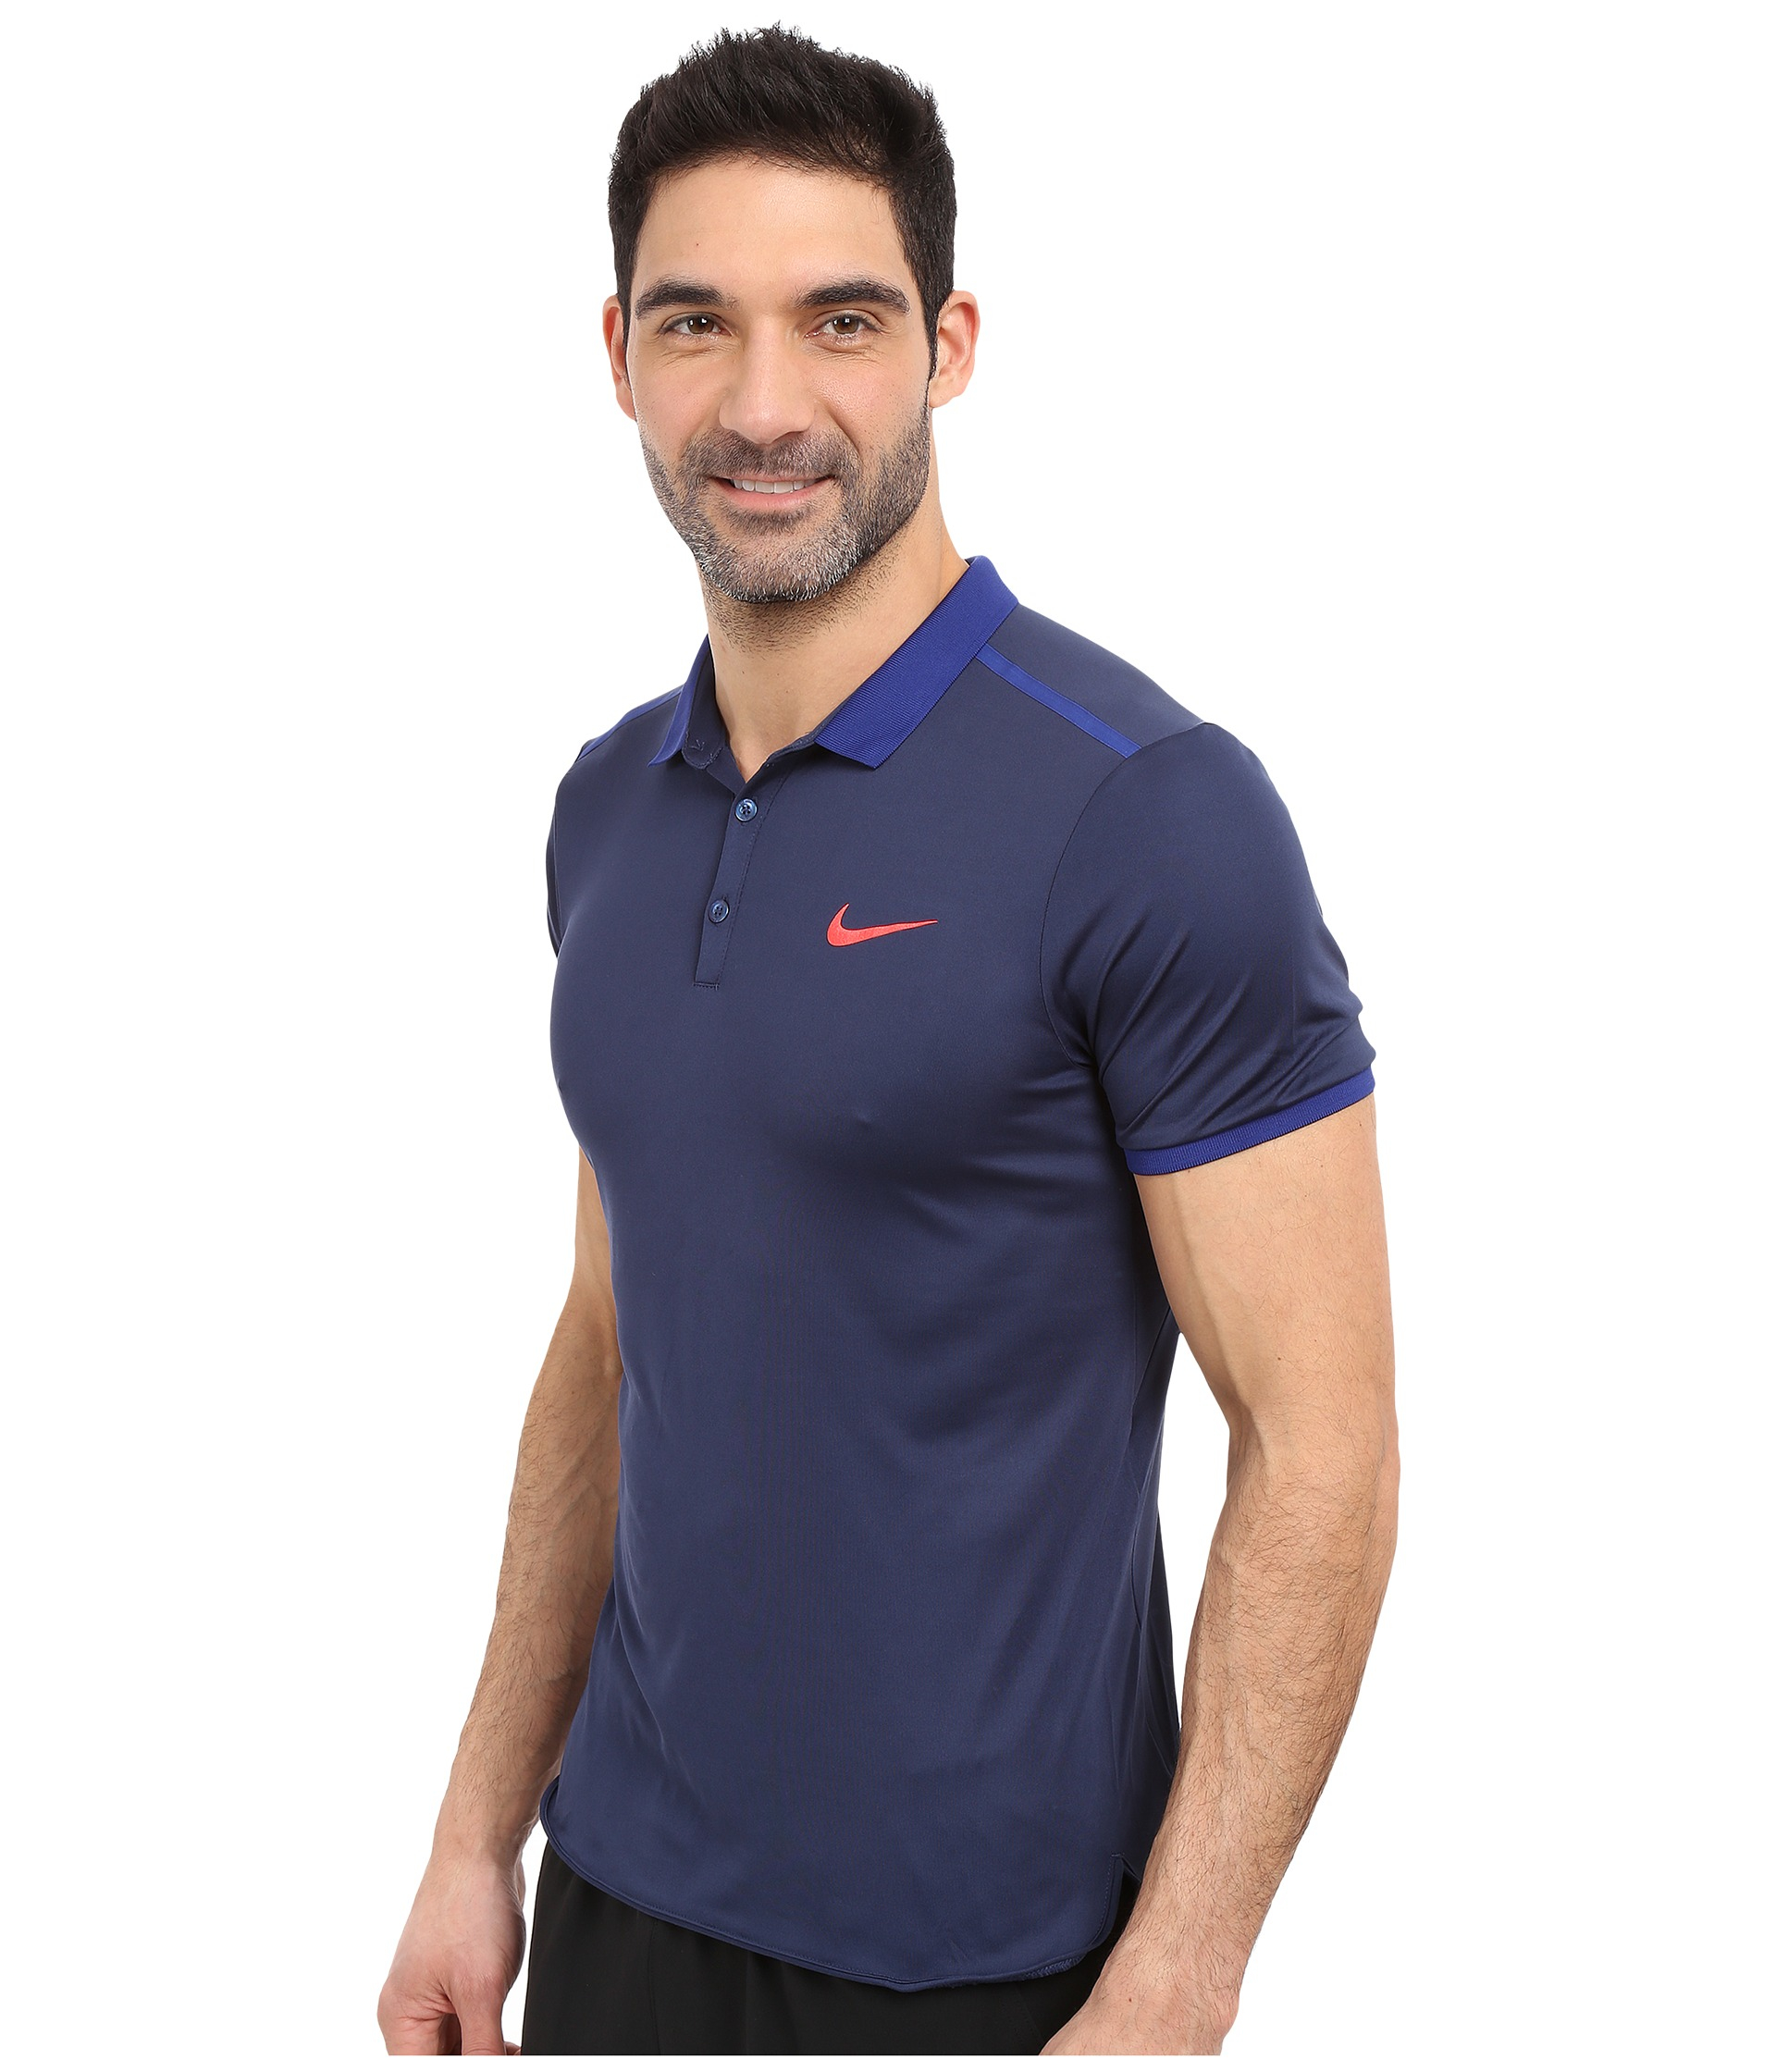 b68682de Nike Court Advantage Solid Tennis Polo in Blue for Men - Lyst